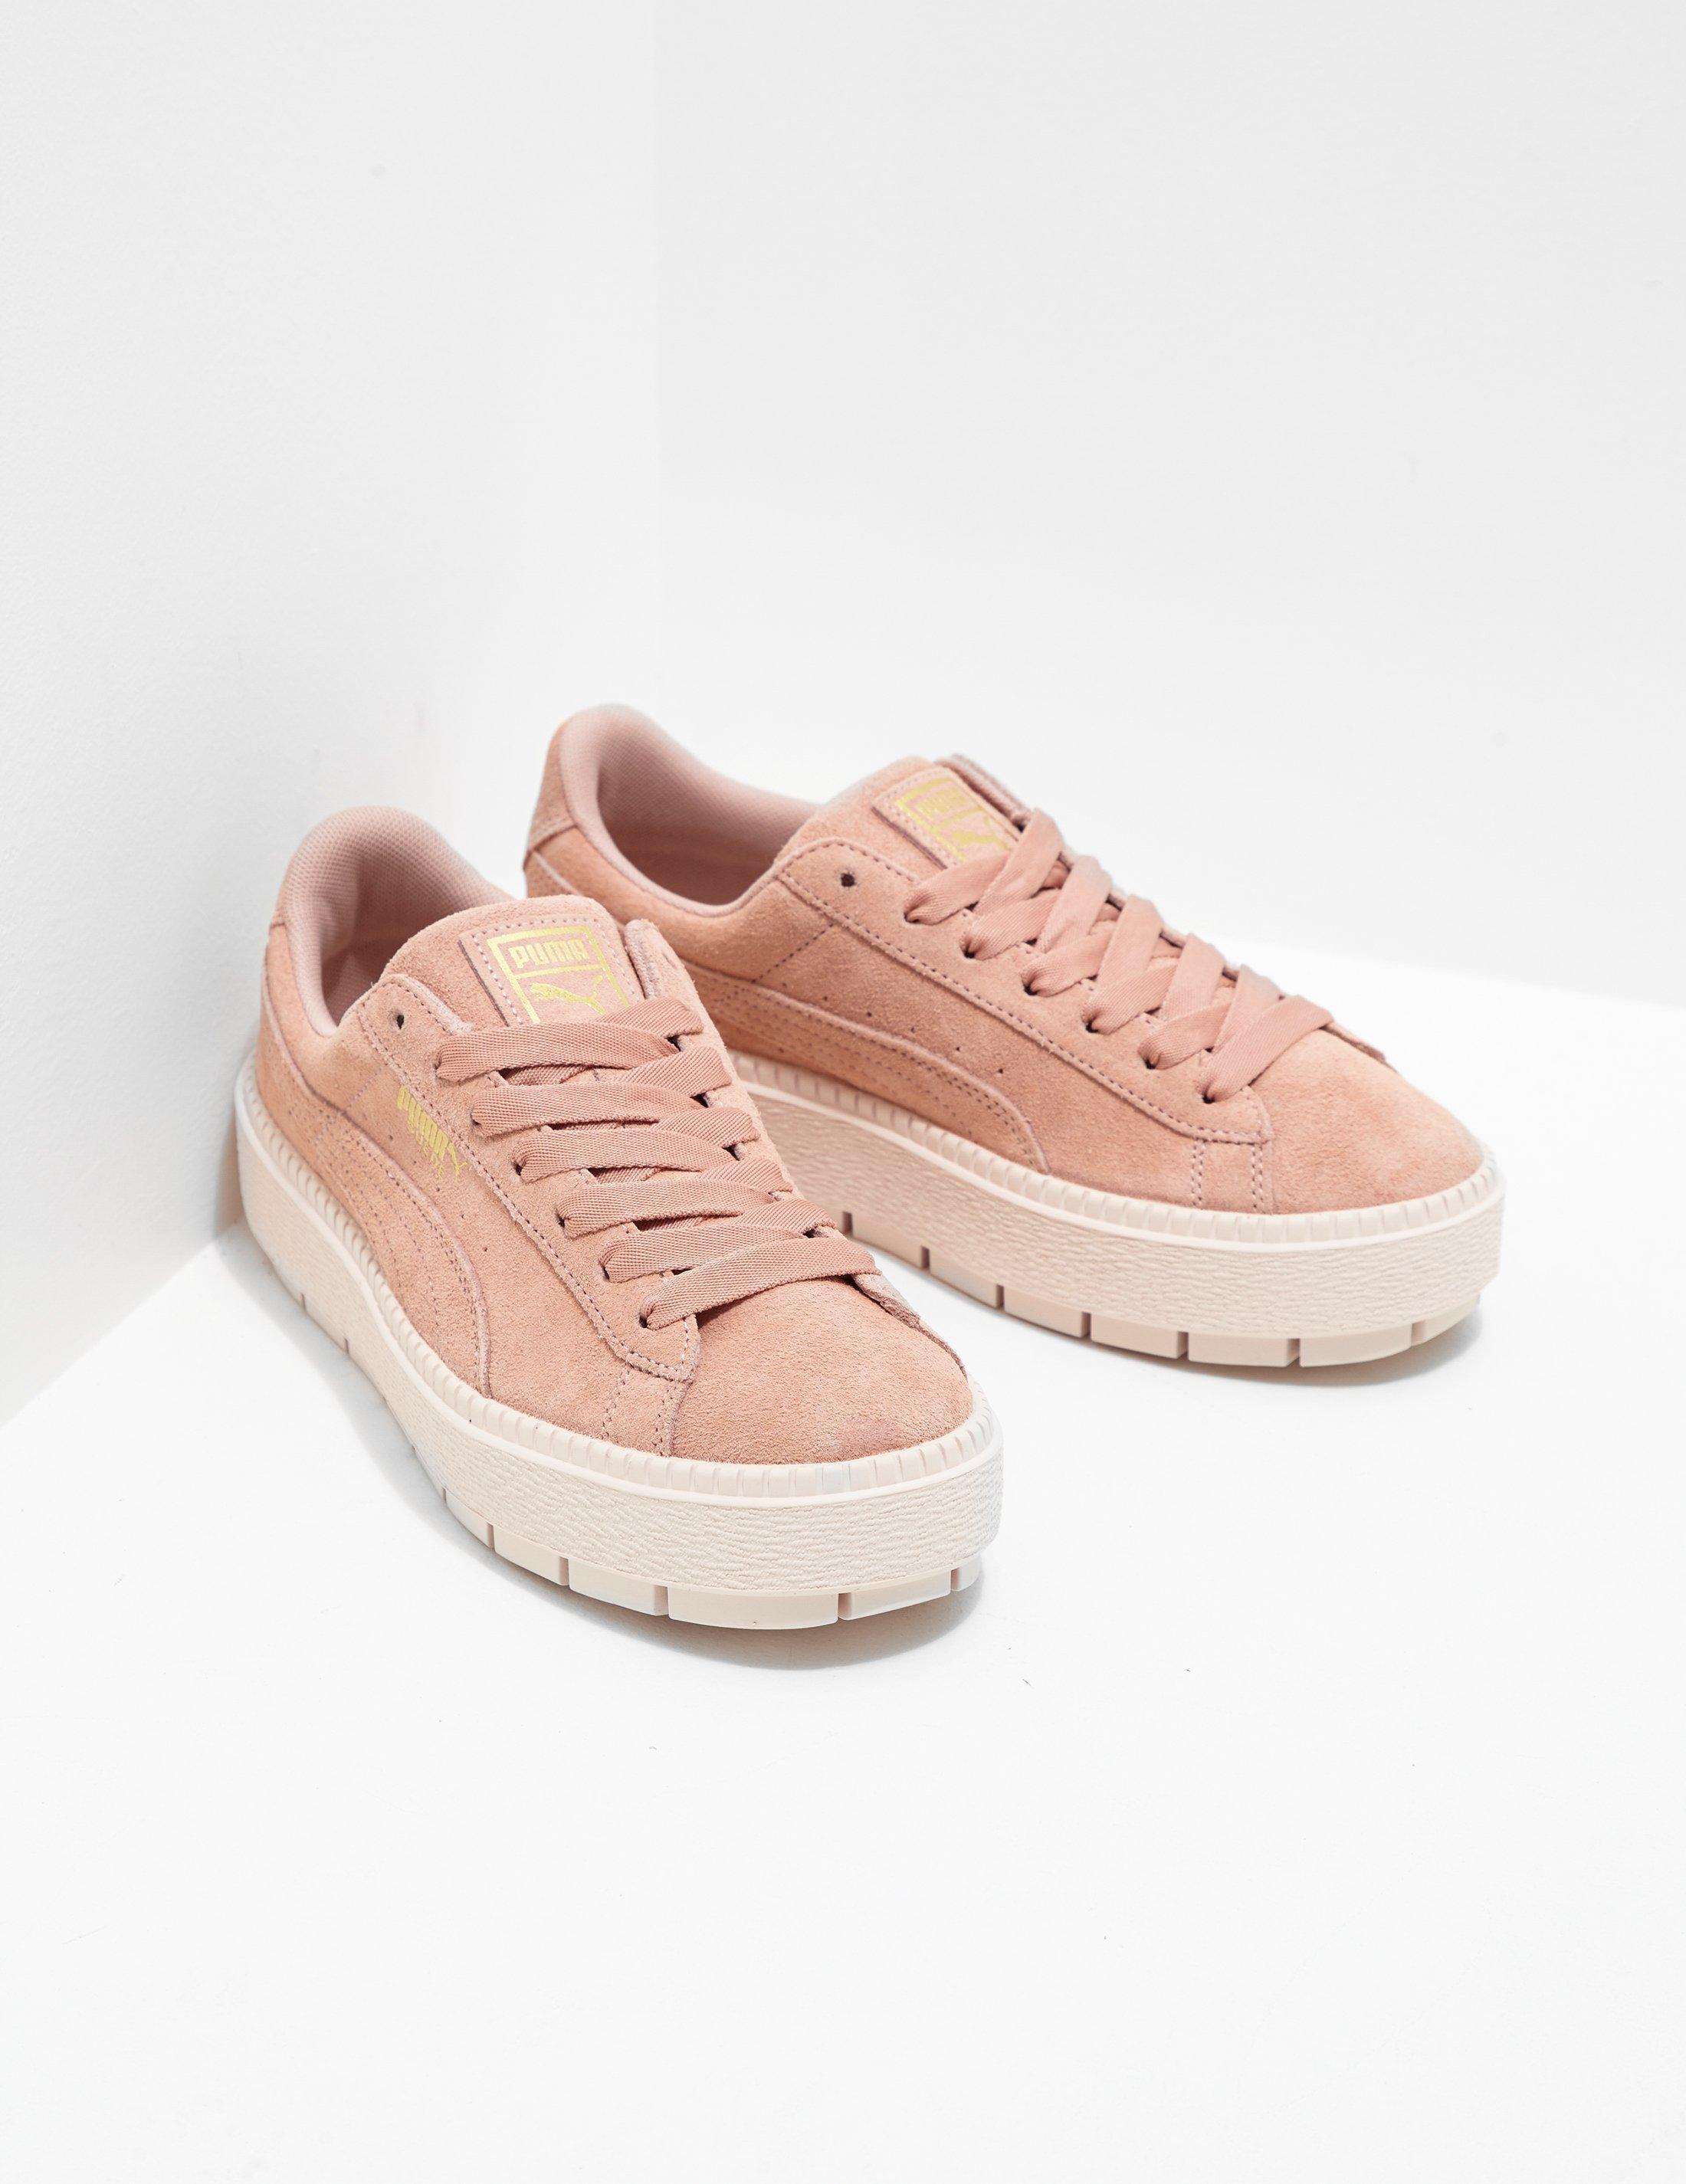 PUMA Suede Platform Trace Women's Pink